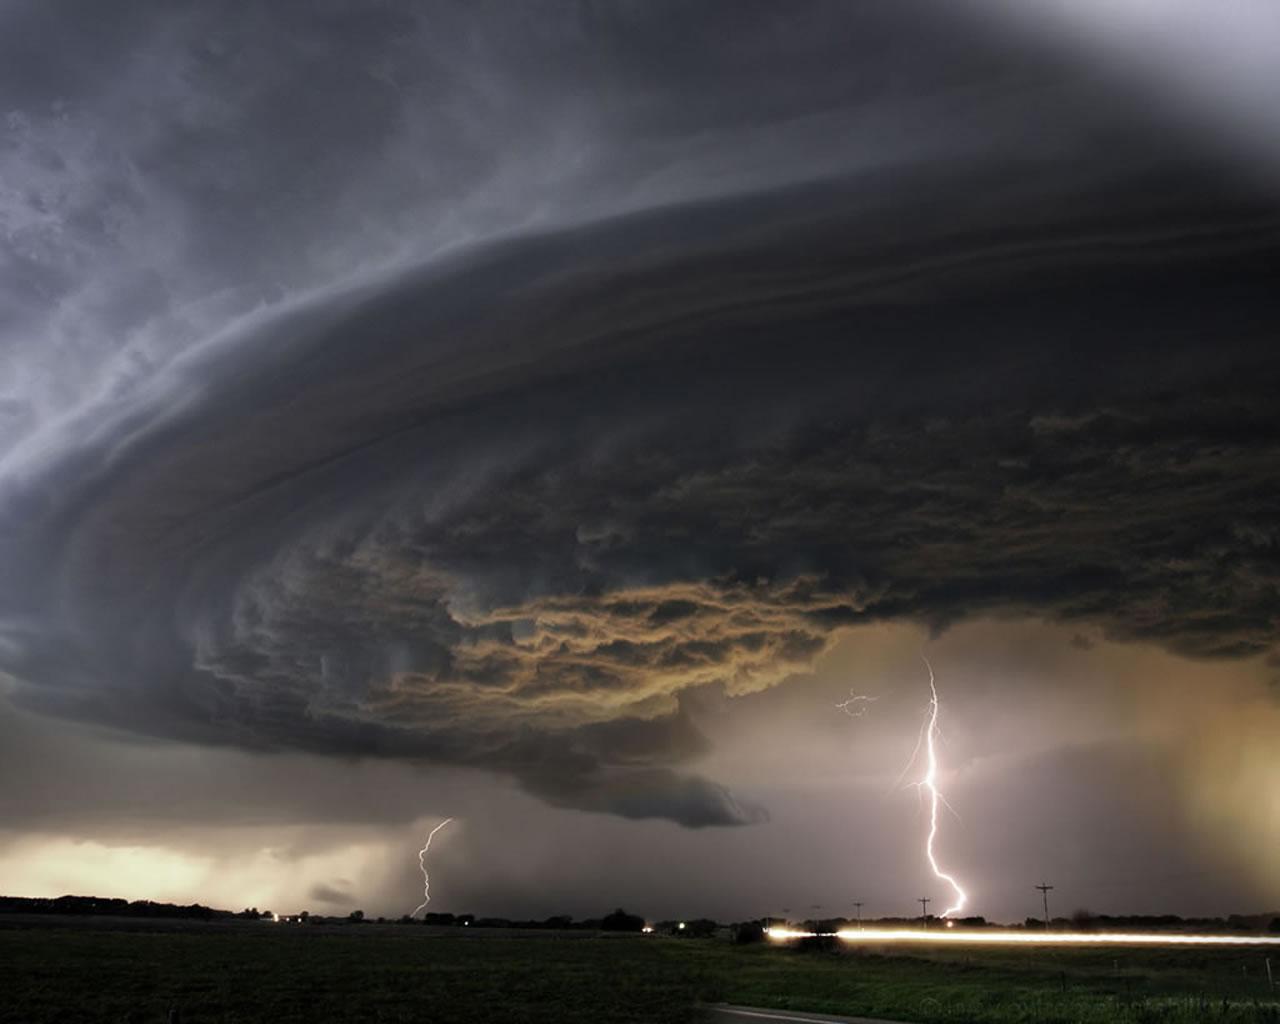 Great Tornado Storm 1280x1024